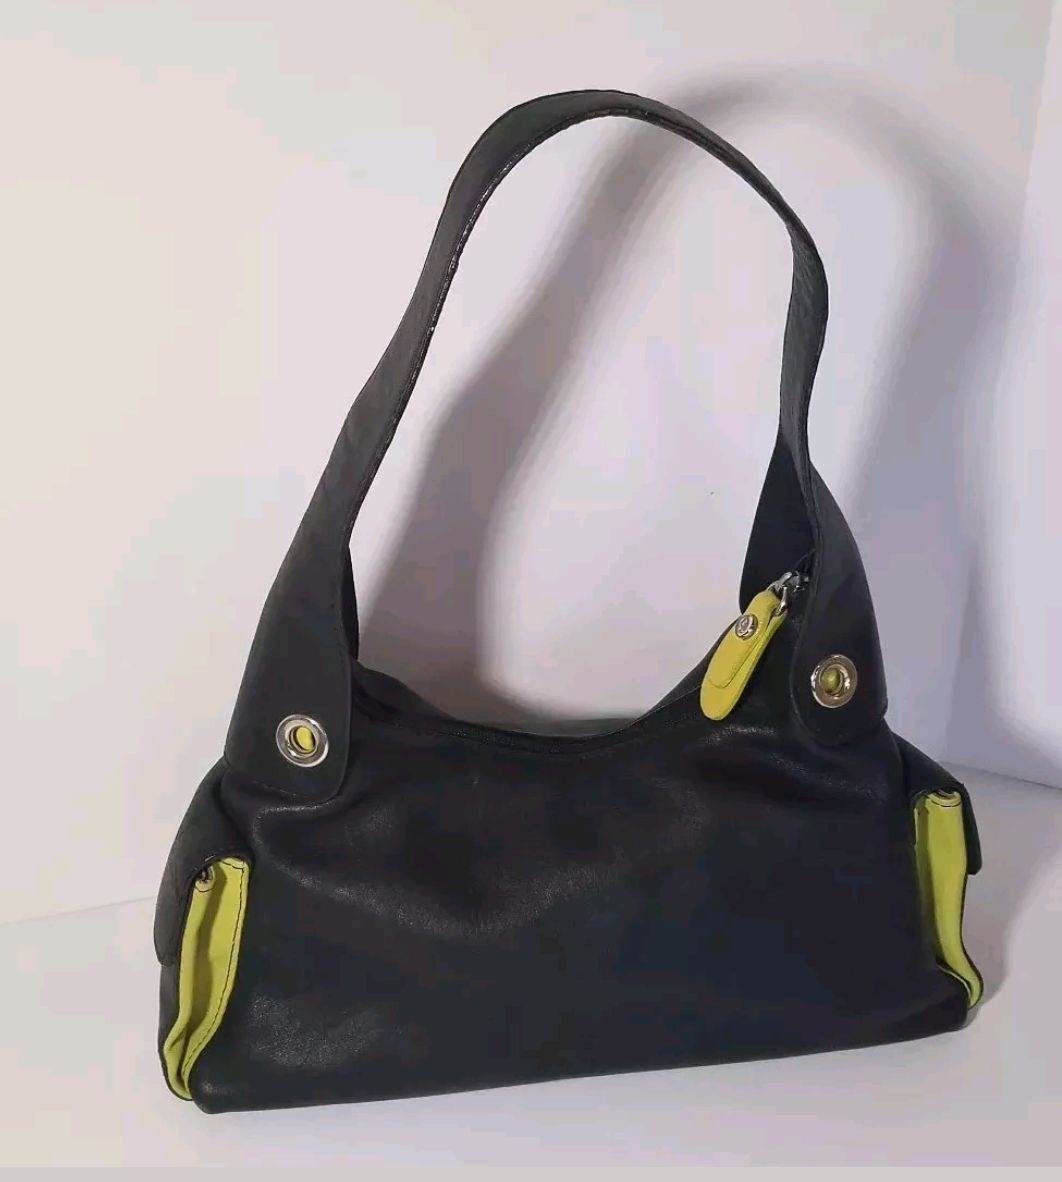 9e38b2de51 Carla Sade Small Hobo Leather Bag